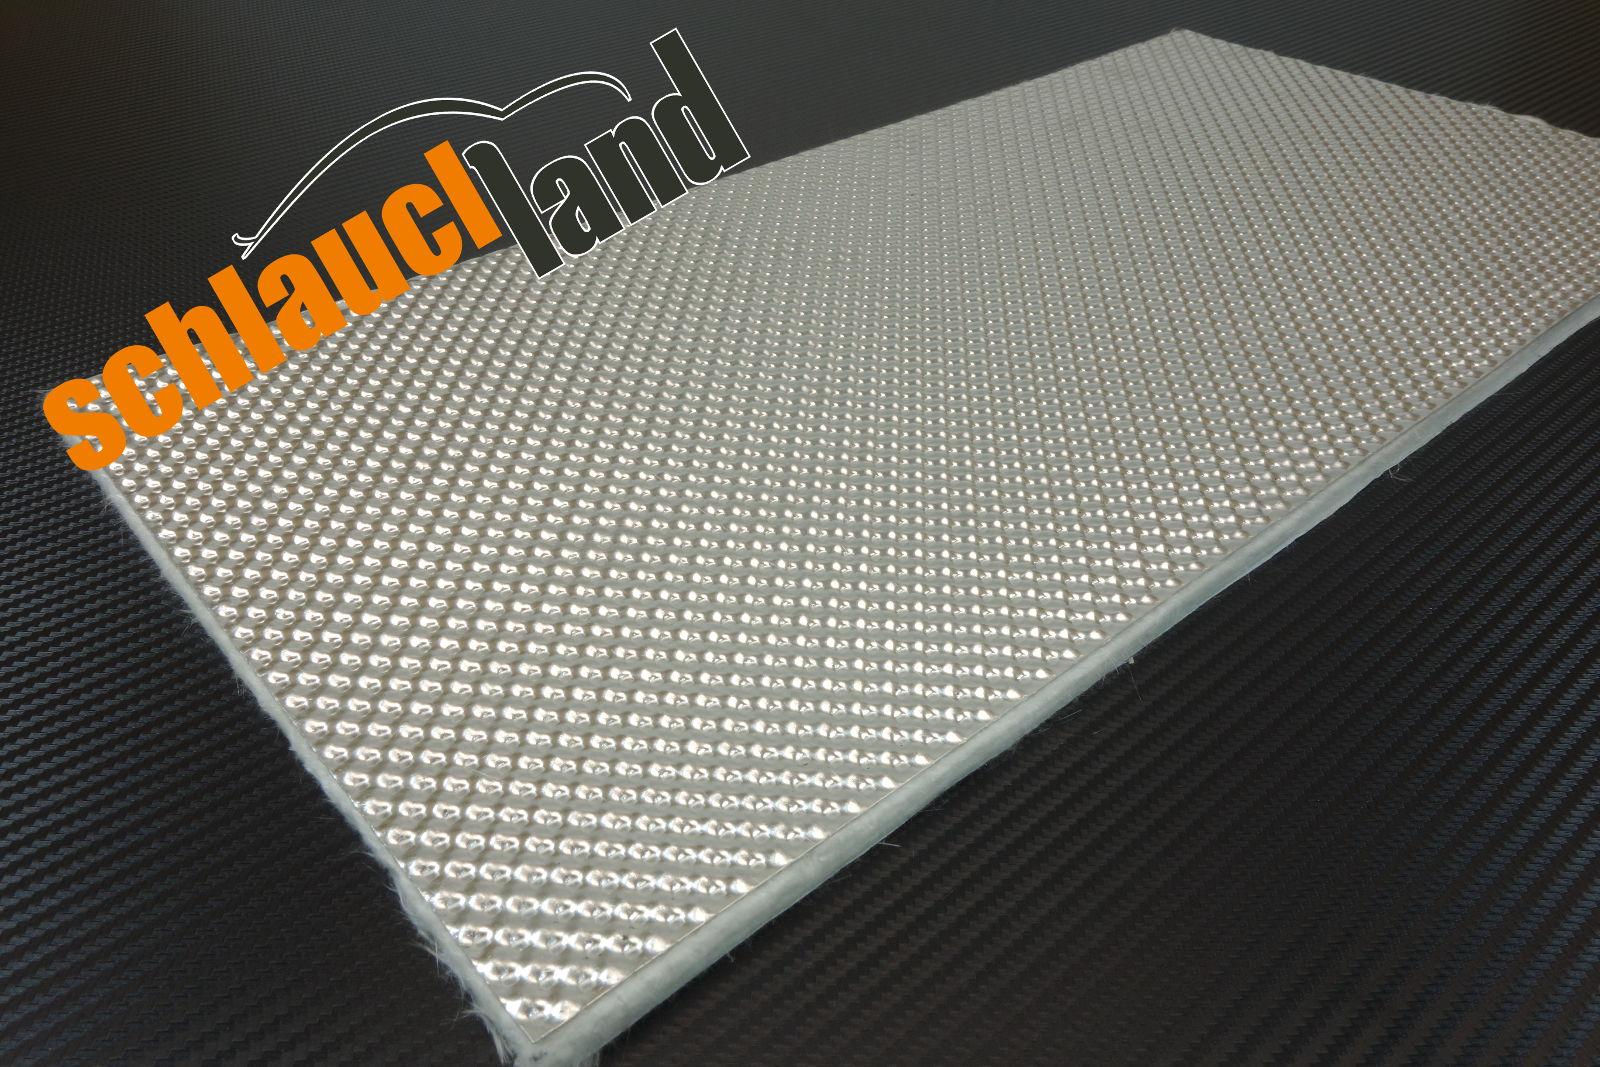 Alu-Keramik Hitzeschutzmatte ULTRA selbstklebend 0,5m x 0,25m